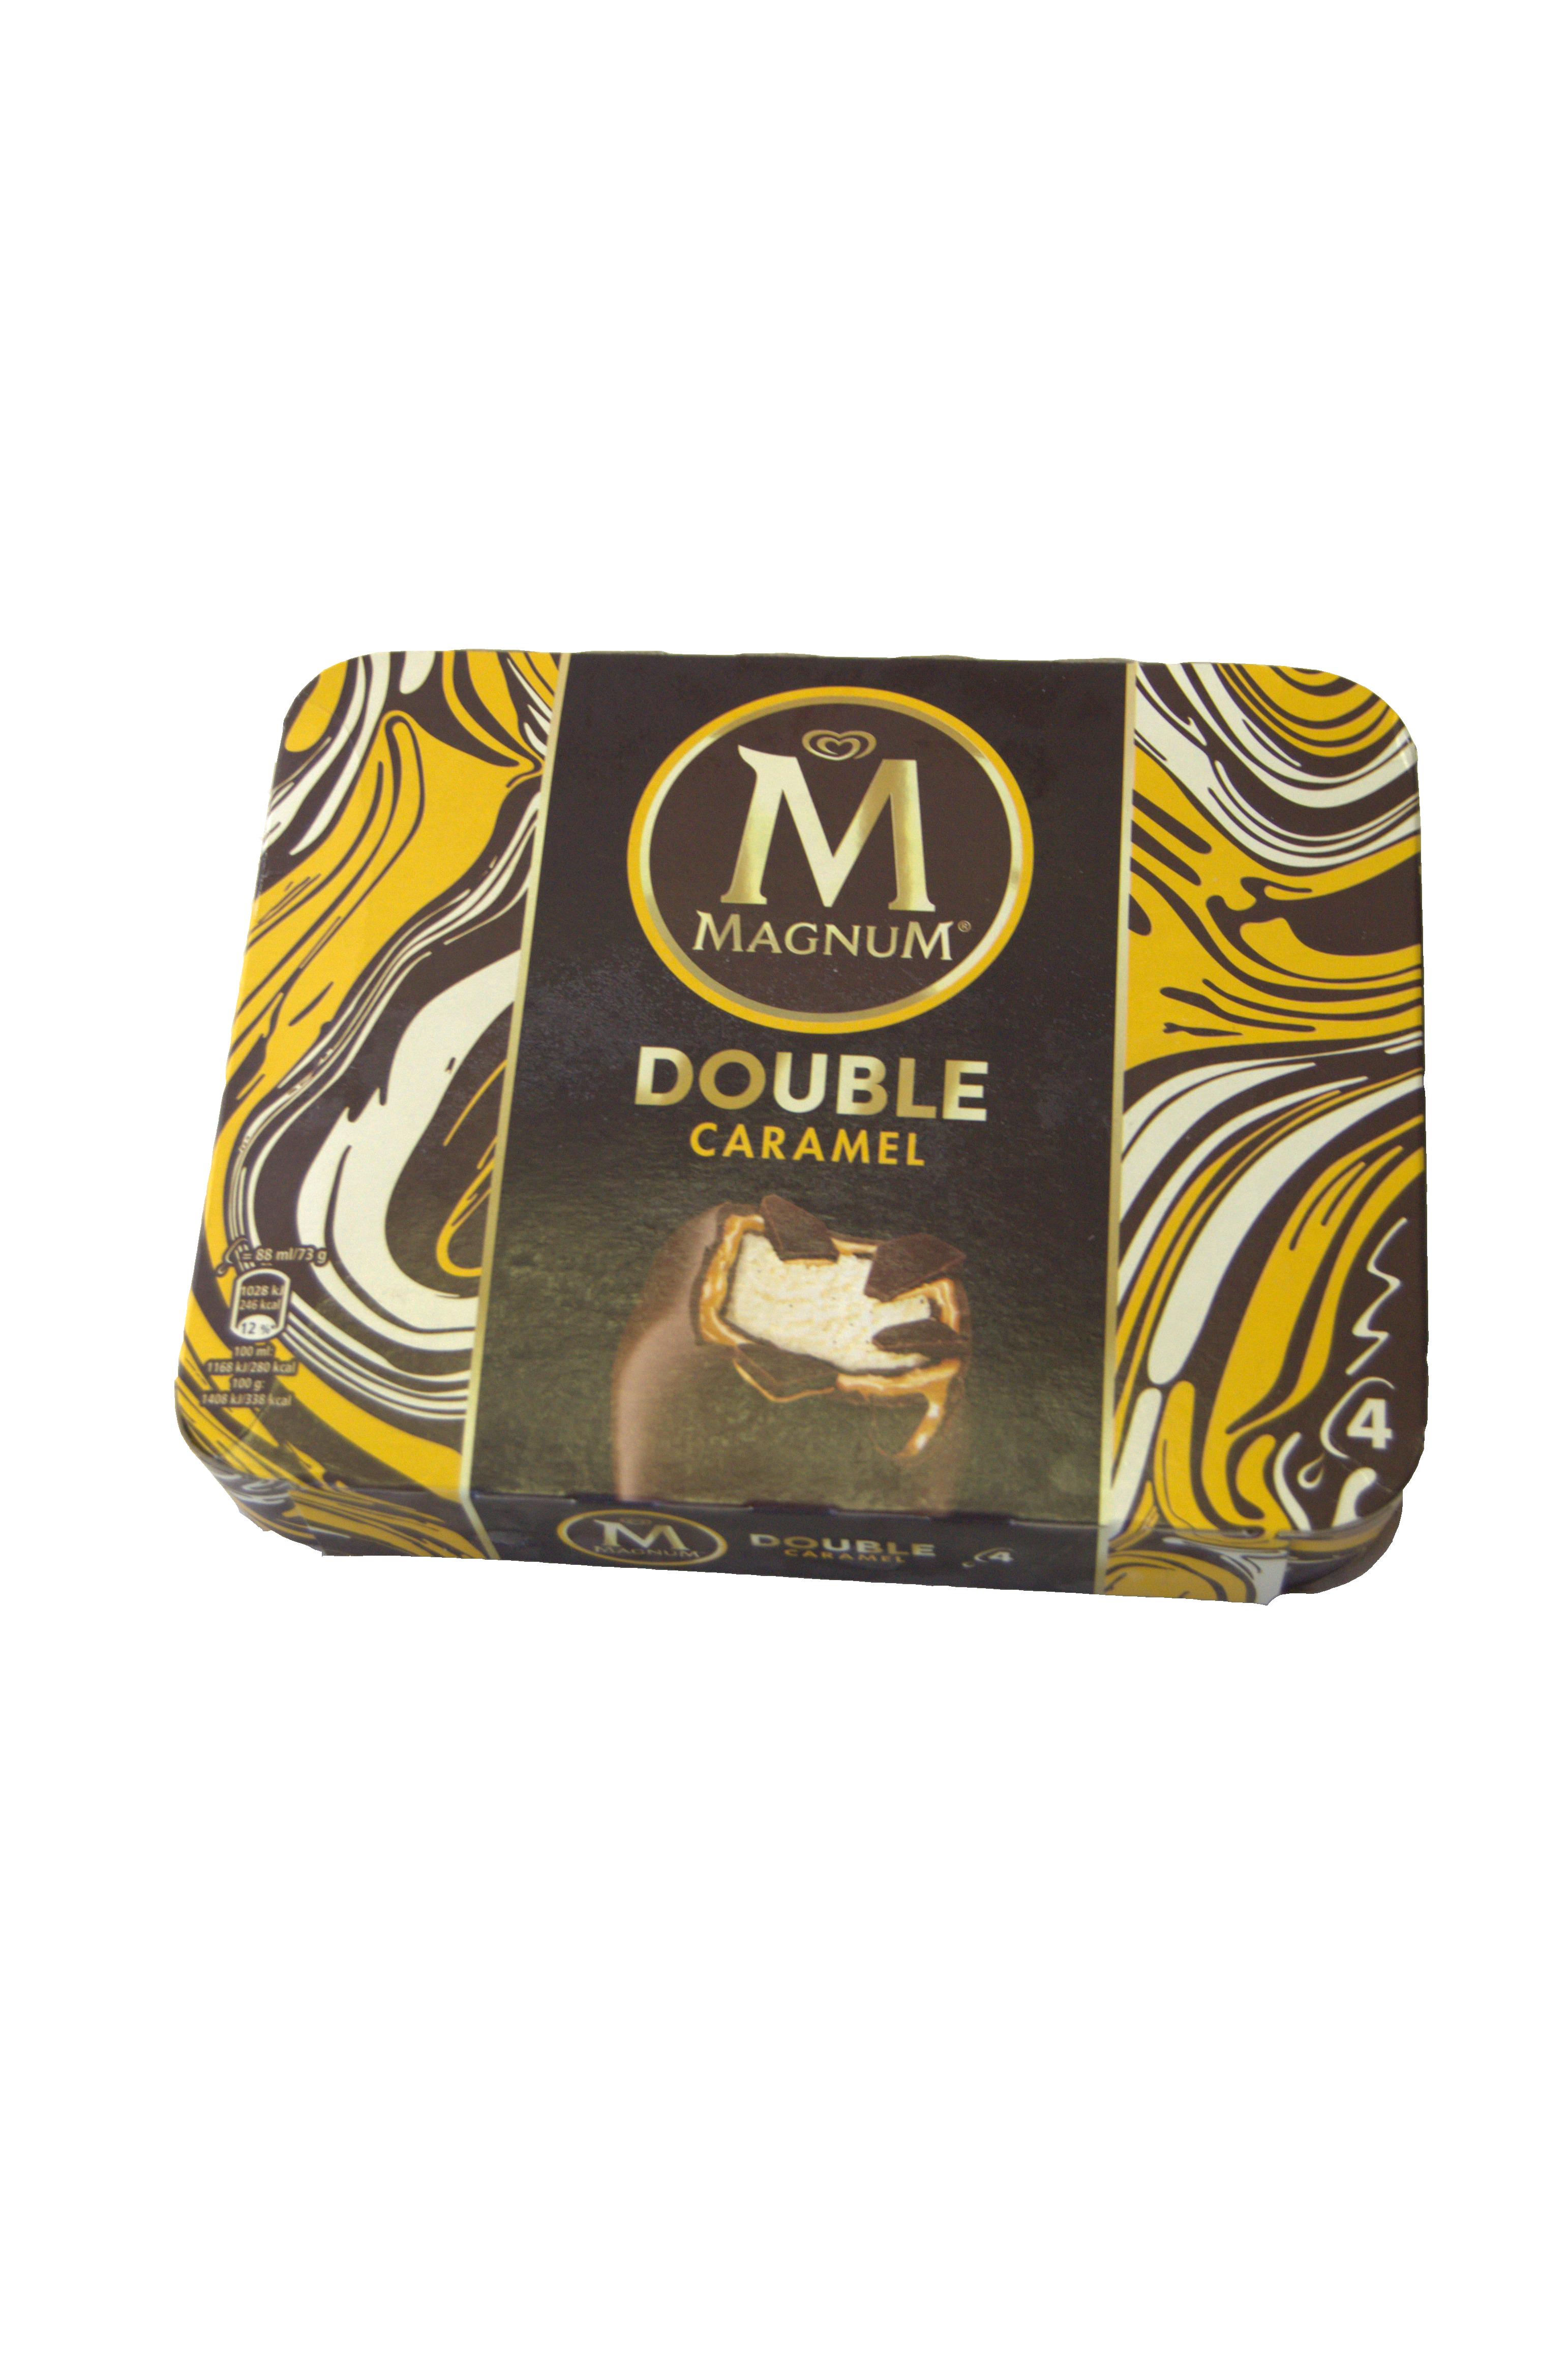 magnum dubbel caramel 4 st